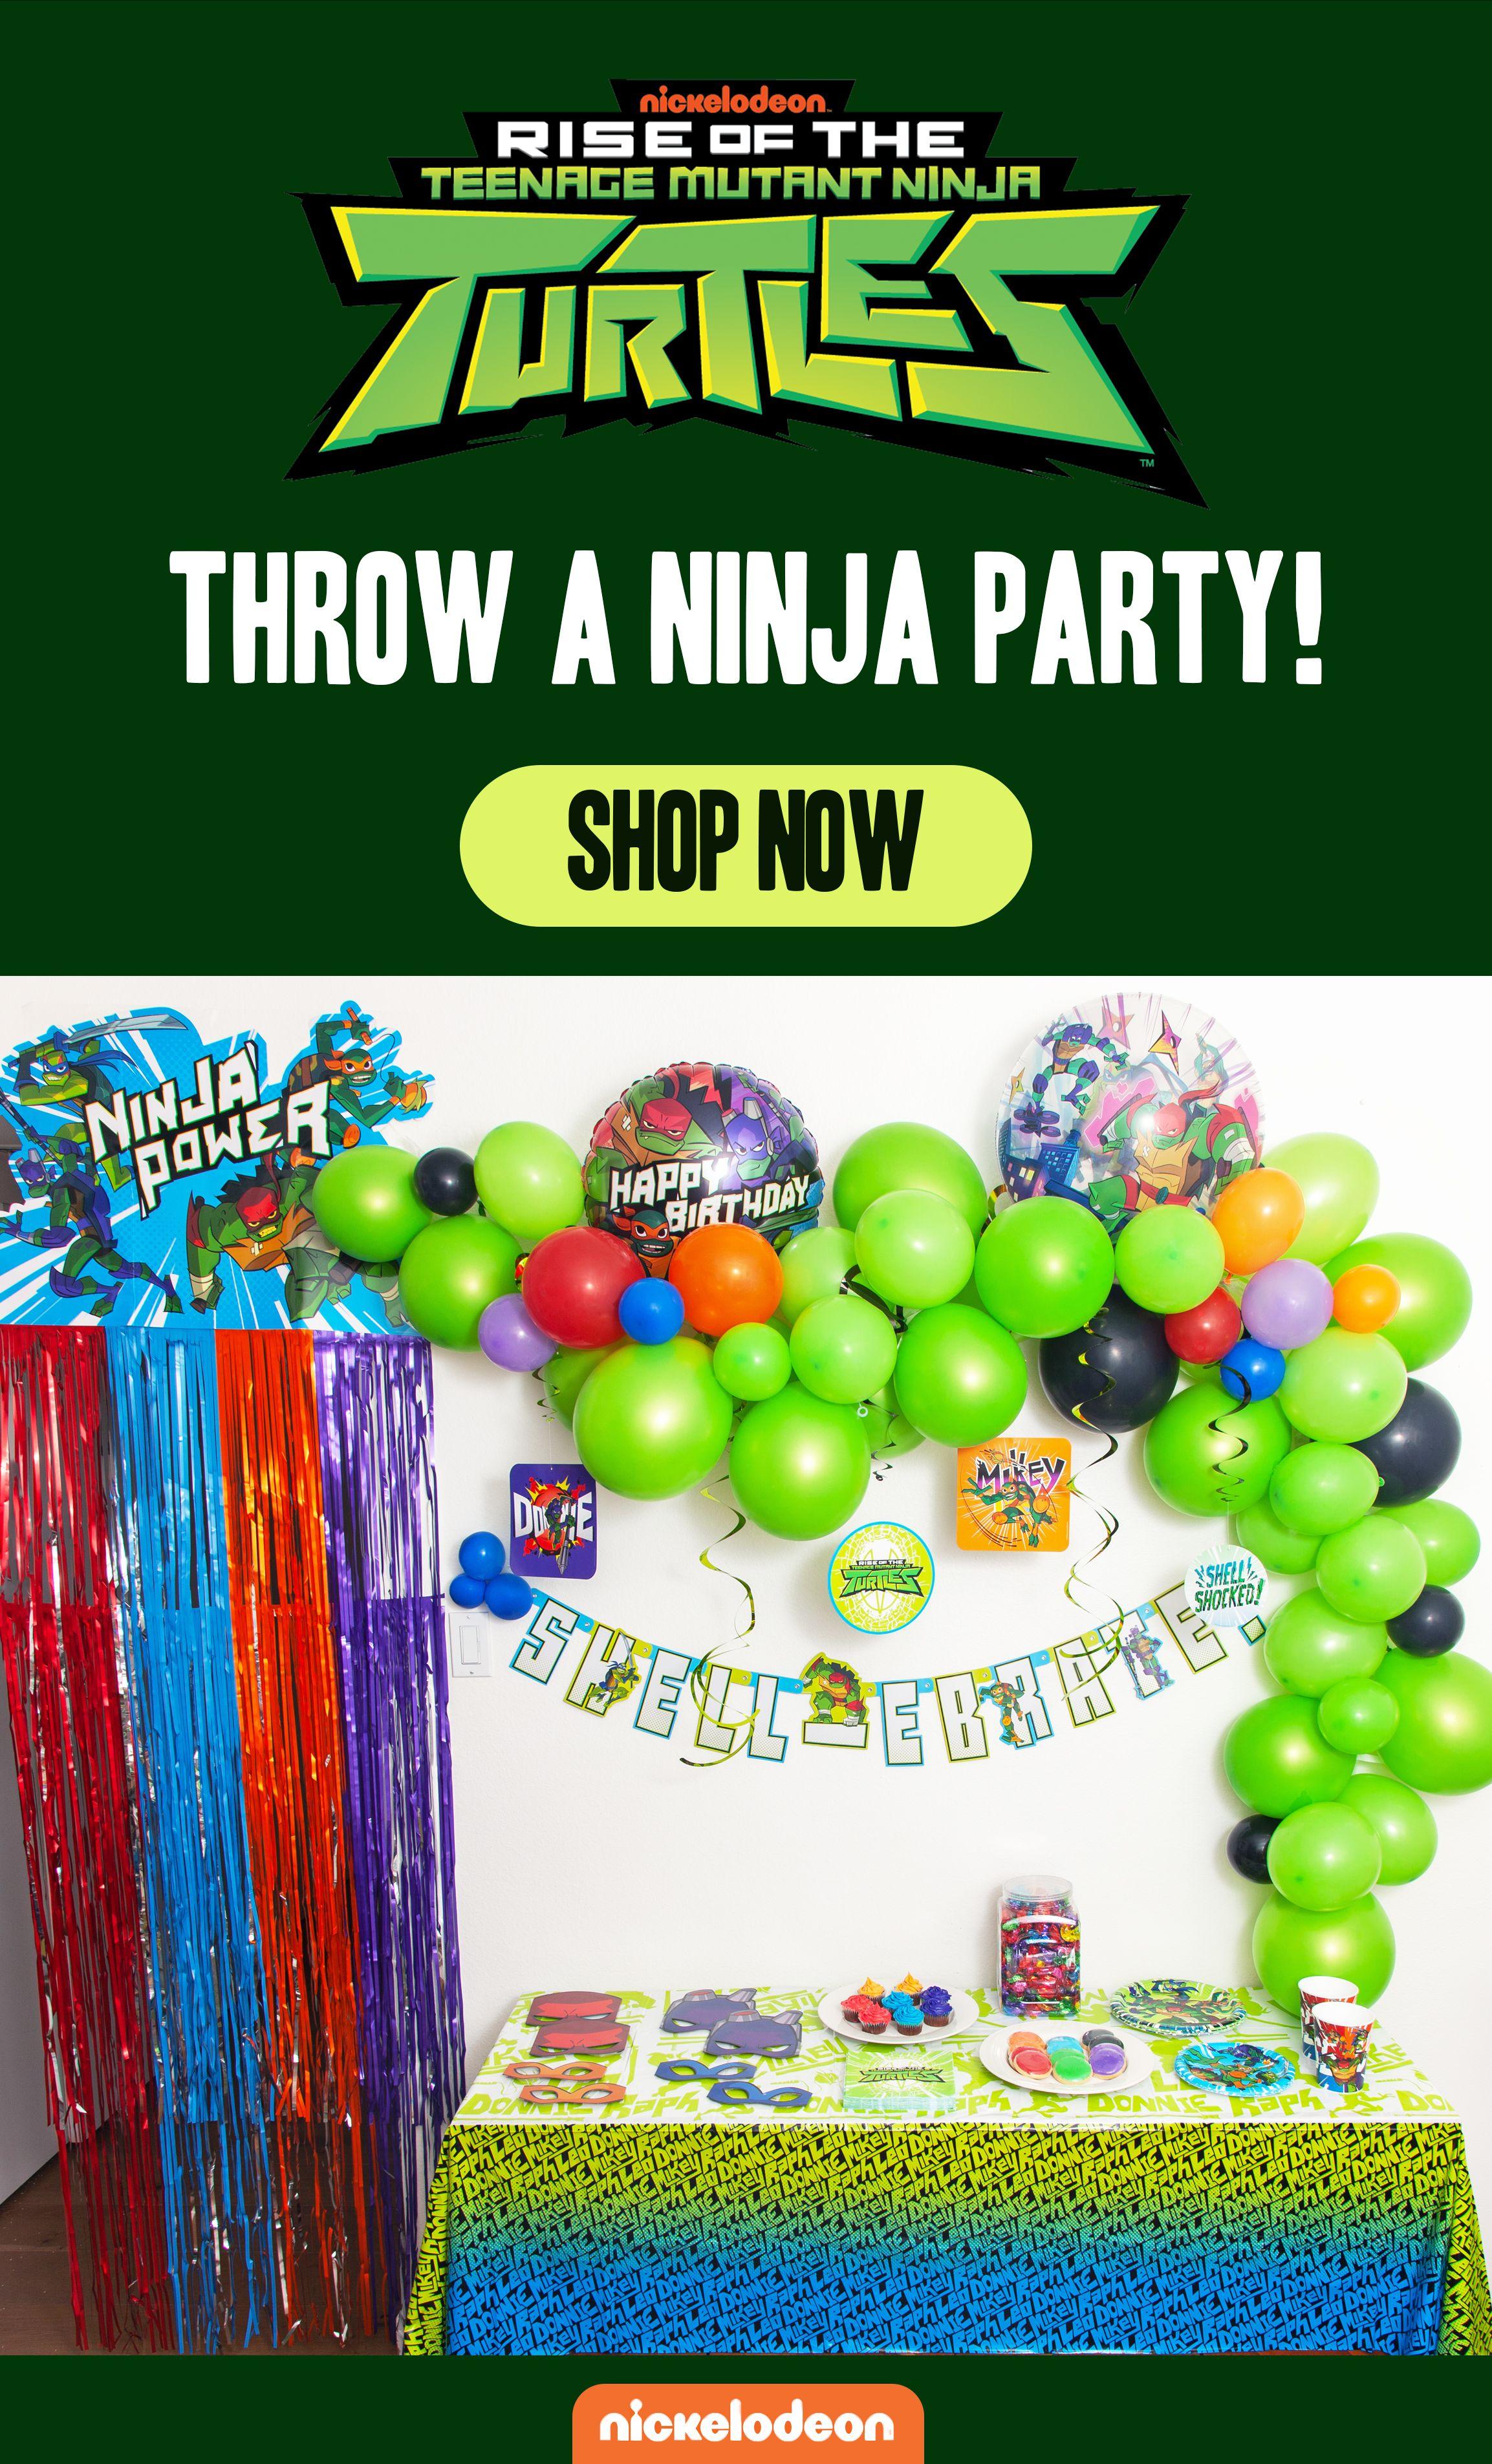 Throw A Ninja Party Ninja Turtle Birthday Mutant Ninja Turtles Party Turtle Birthday Parties